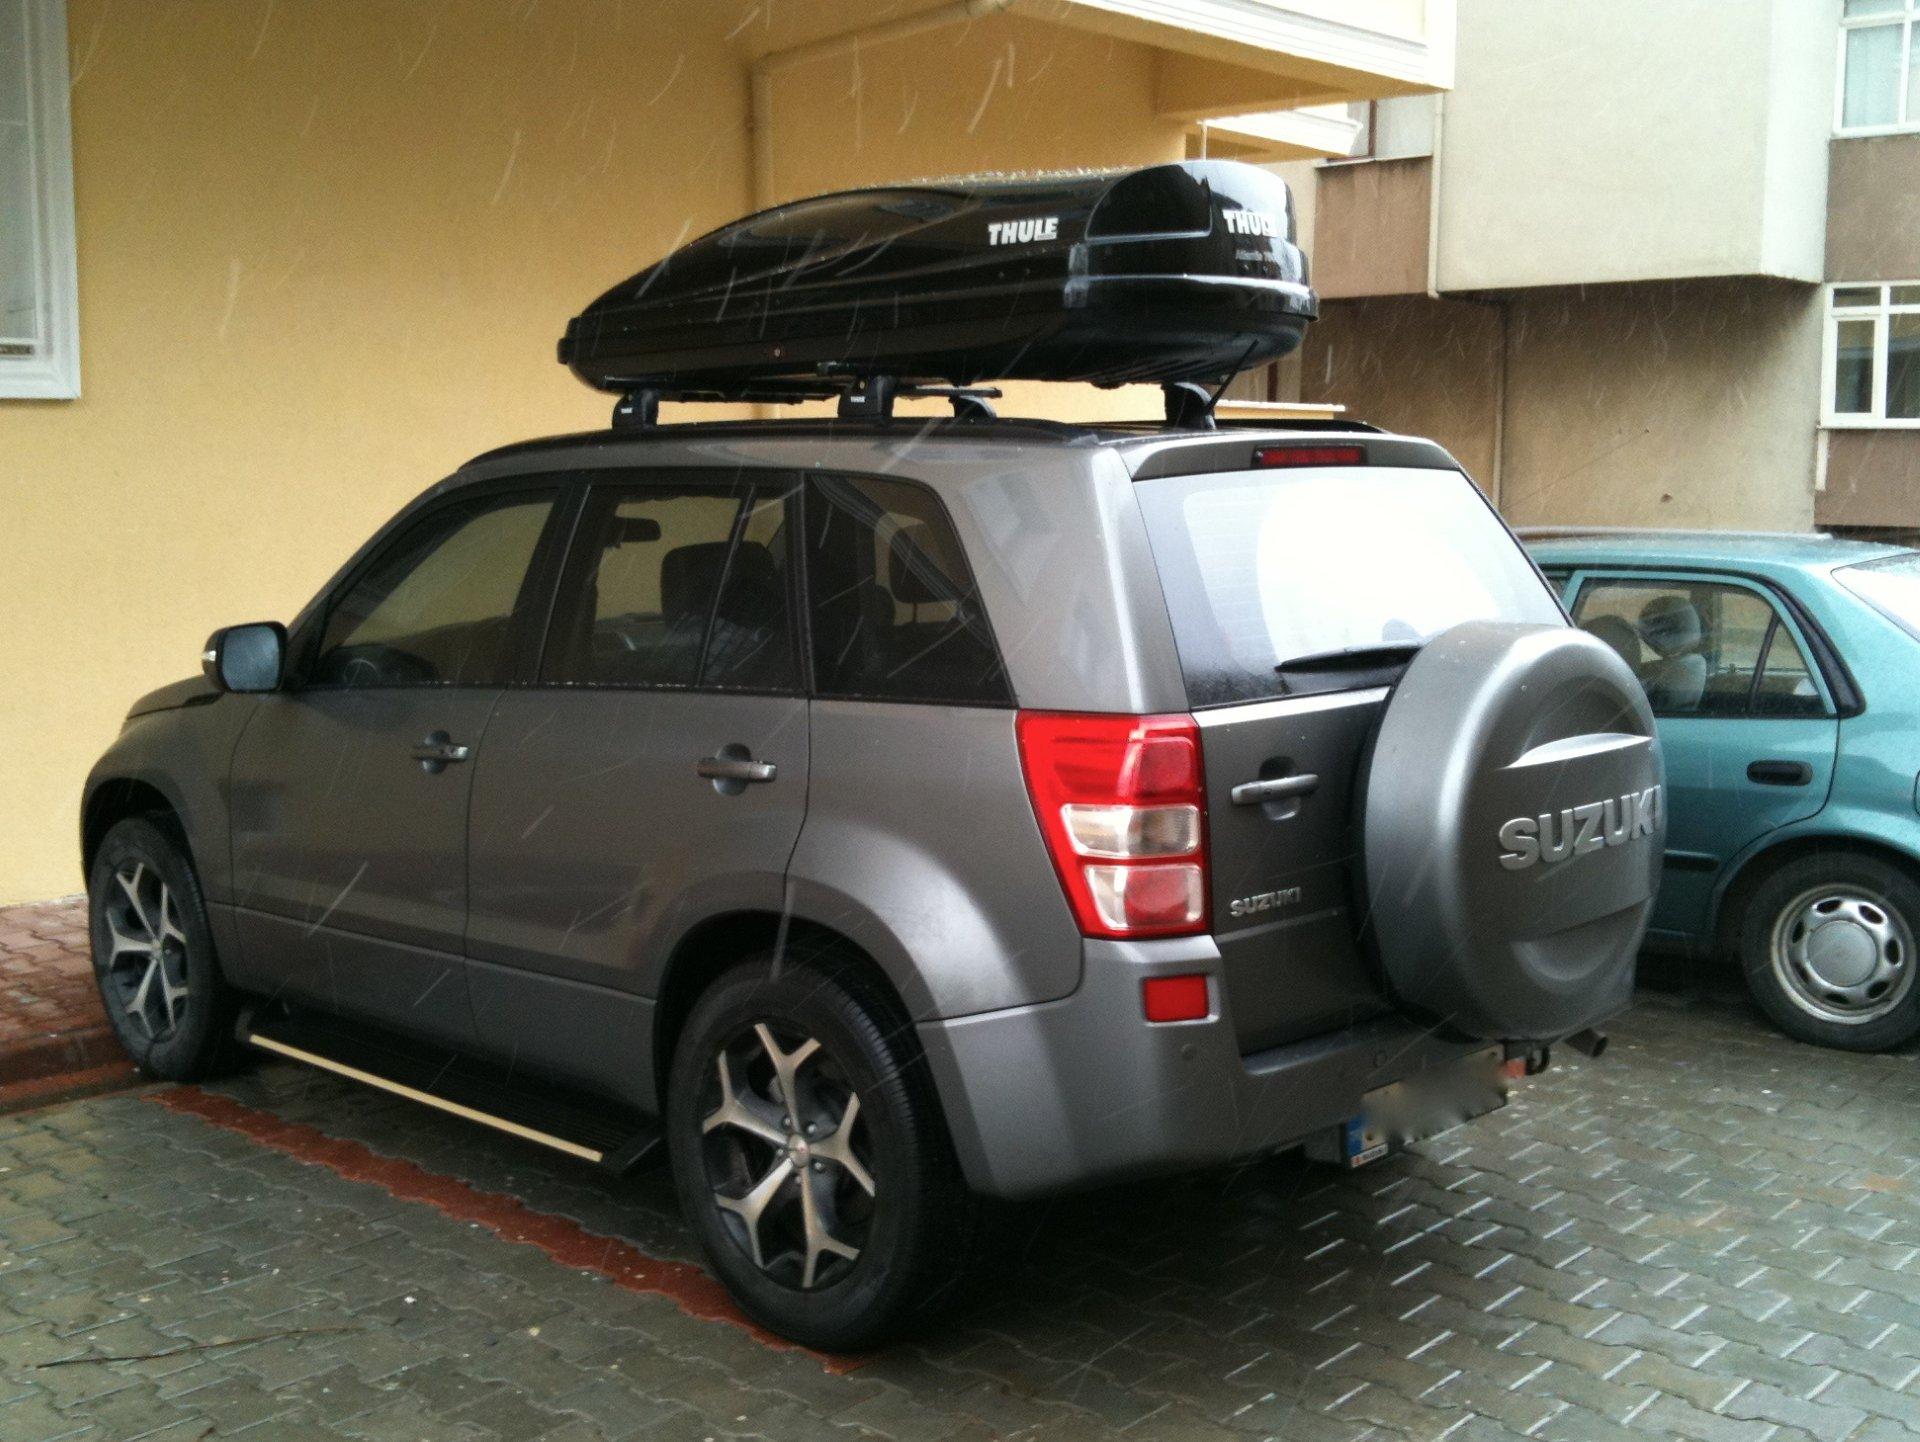 Багажник на крышу Suzuki Grand Vitara (Сузуки Гранд